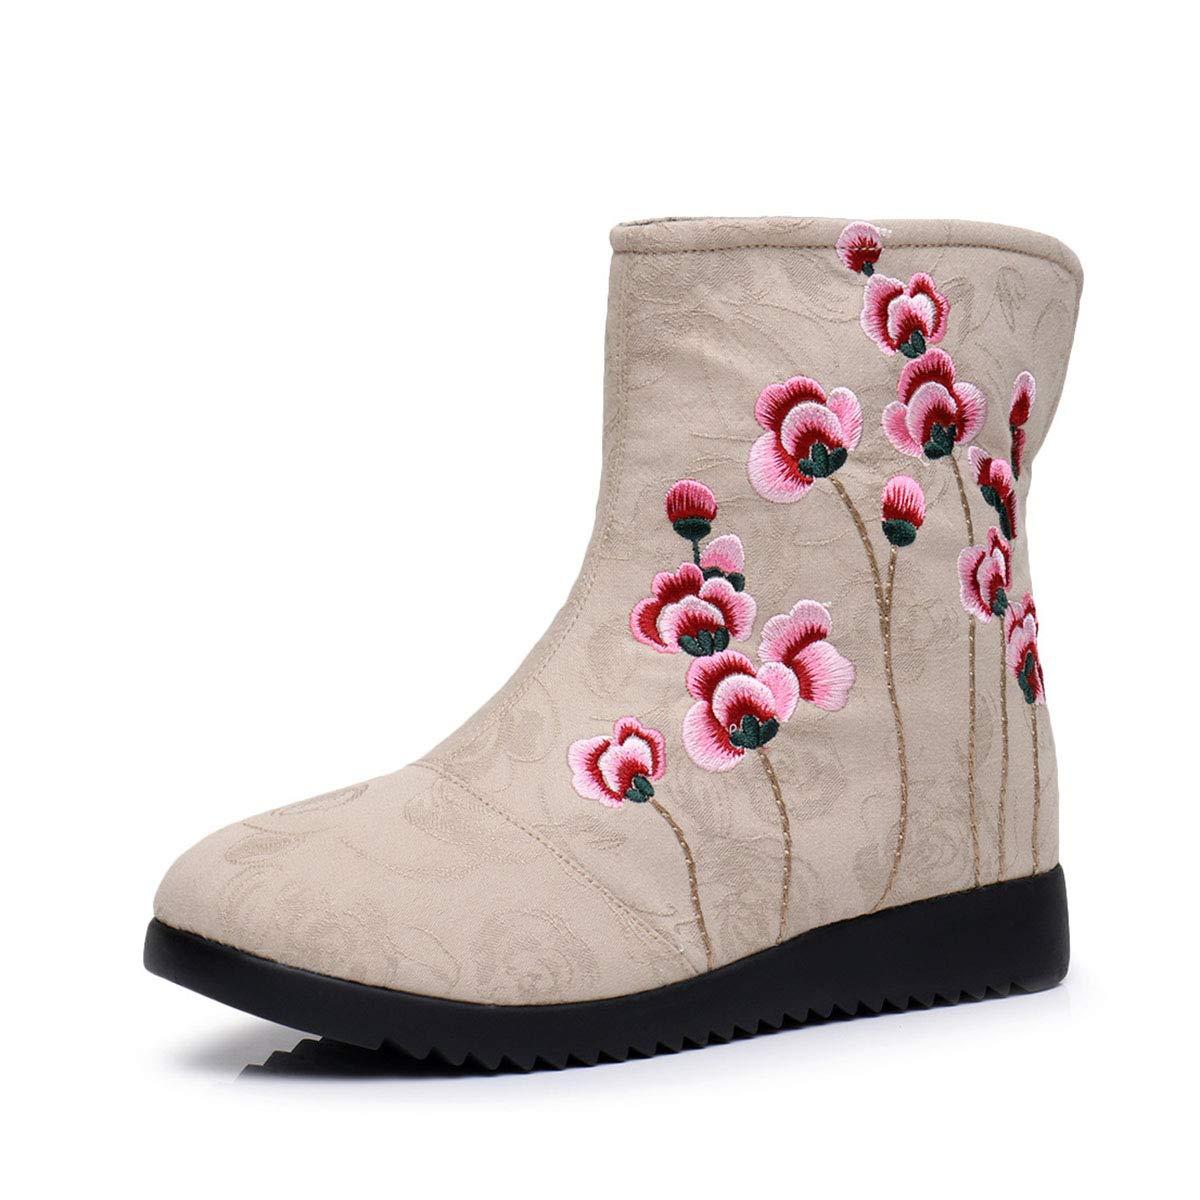 YAN damen Stickerei Schuhe Casual Damen Büroarbeit Strap Flats Schuhe Herbst Winter Schuhe Folk-benutzerdefinierte Rutschfeste Besteickte Schuhe